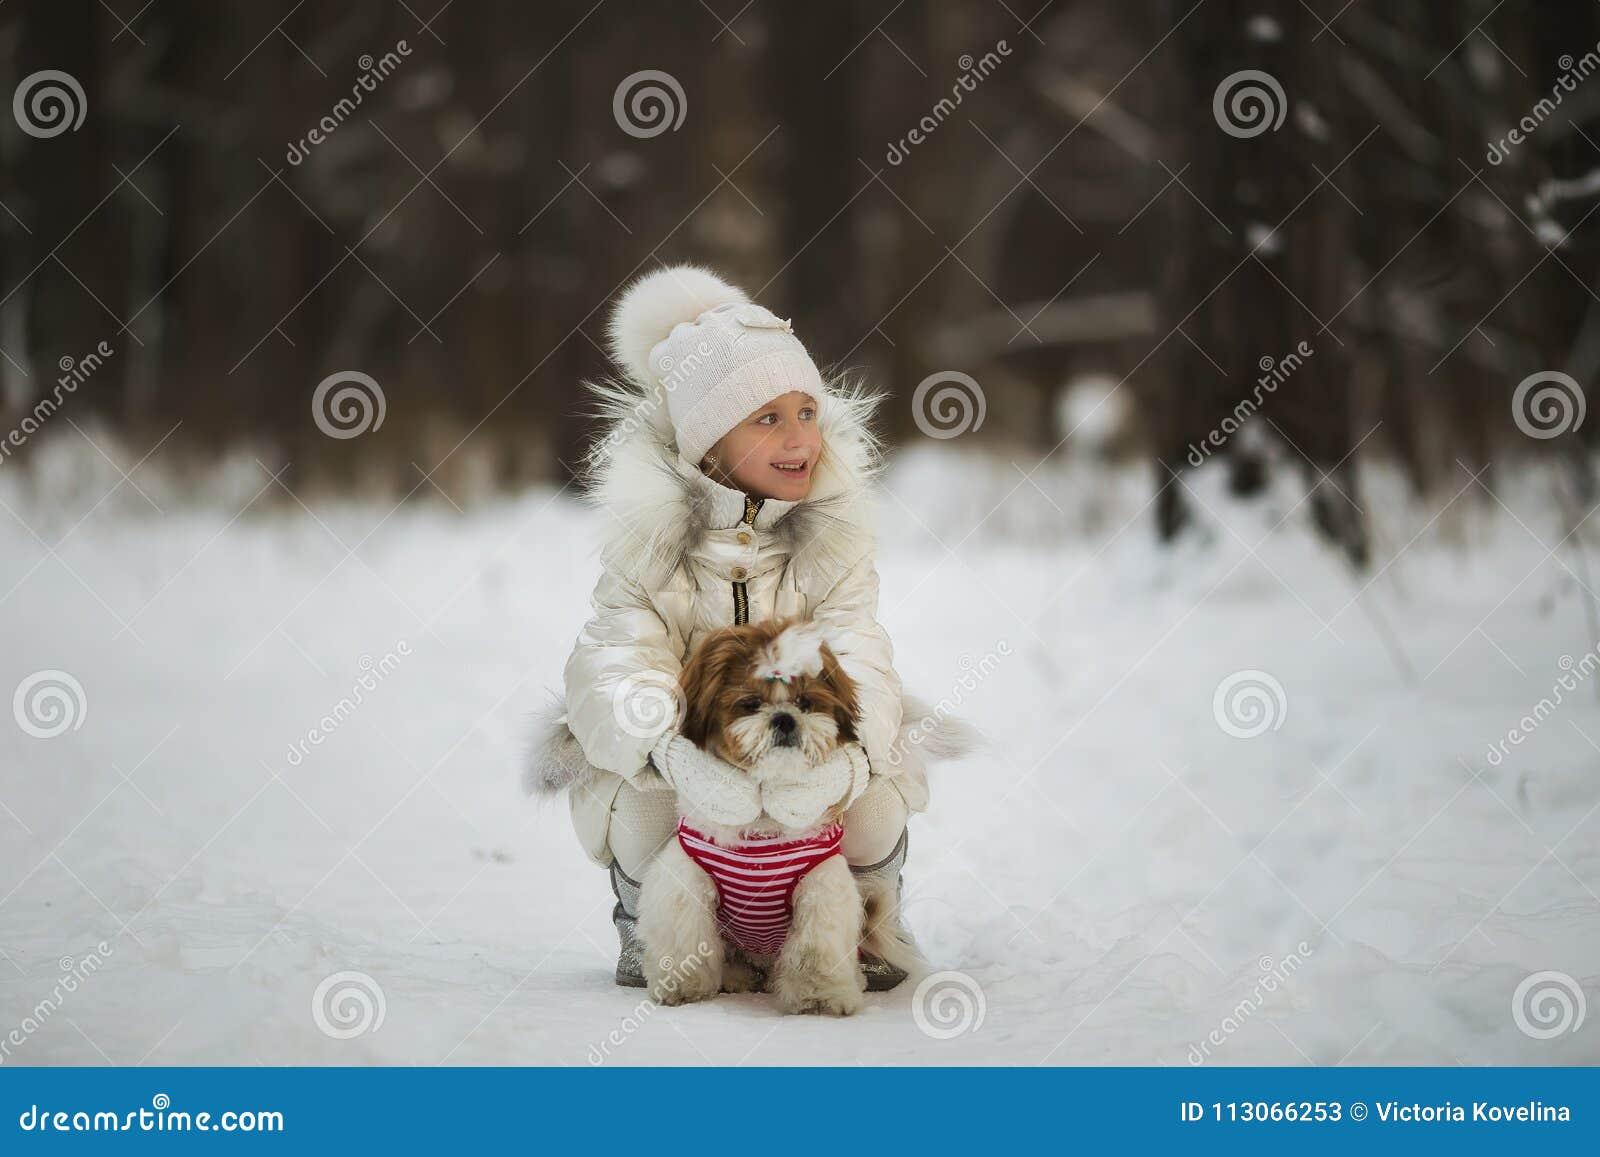 Little Girl Walks With Her Beloved Puppy Shih Tzu Stock Image